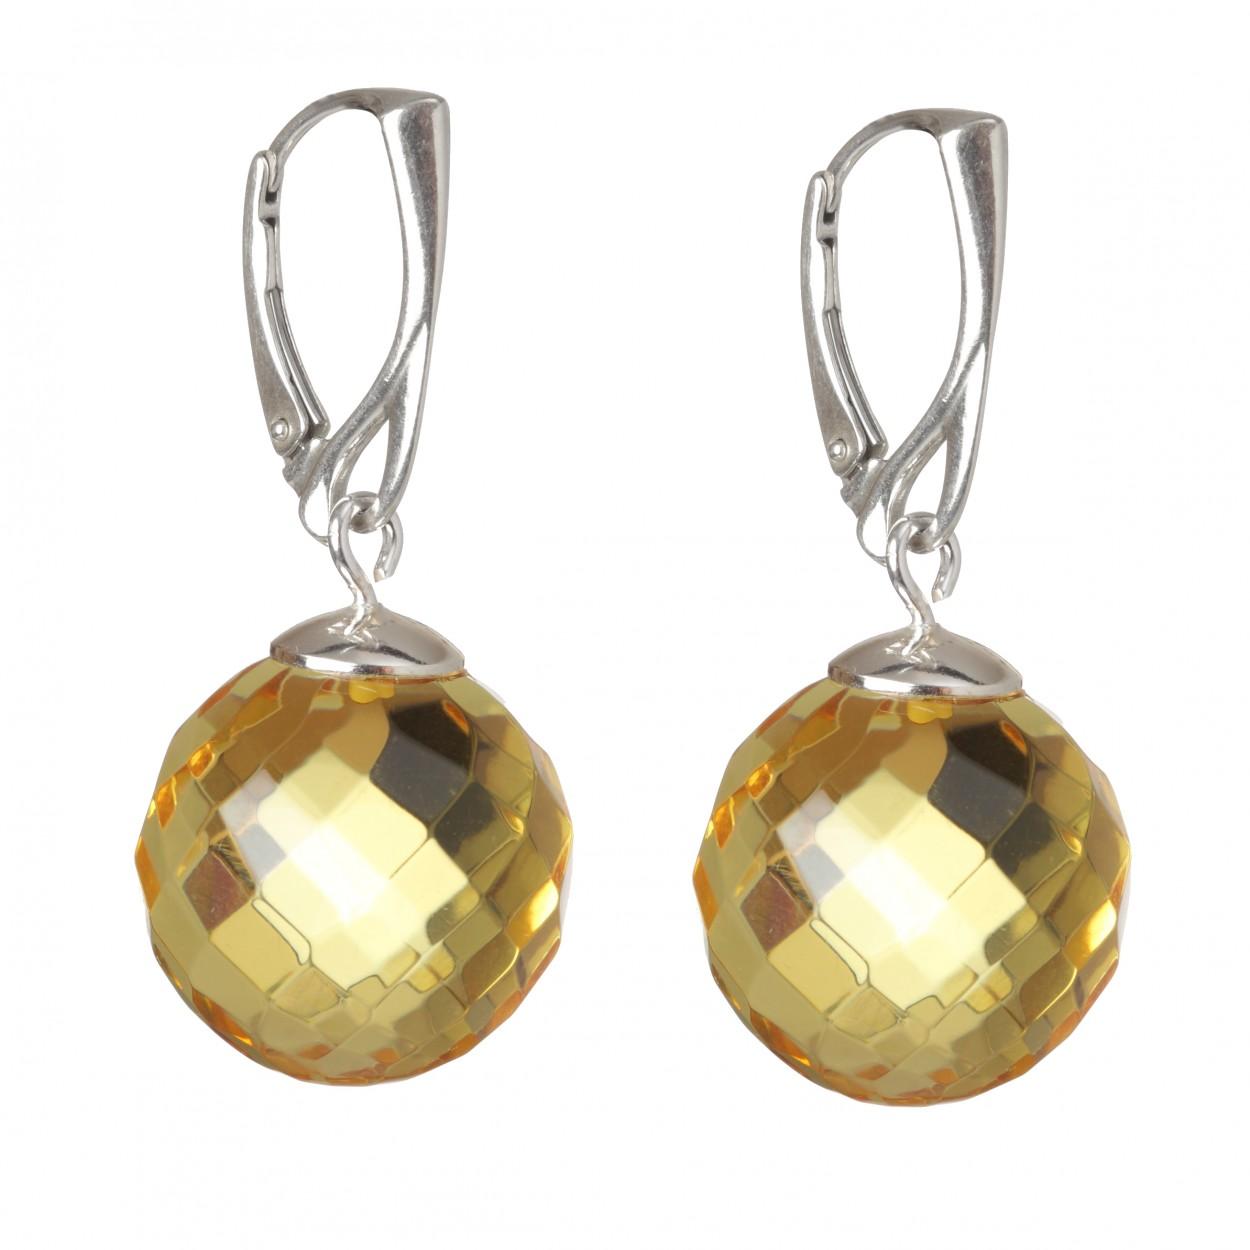 Diamond Beads Amber Earrings